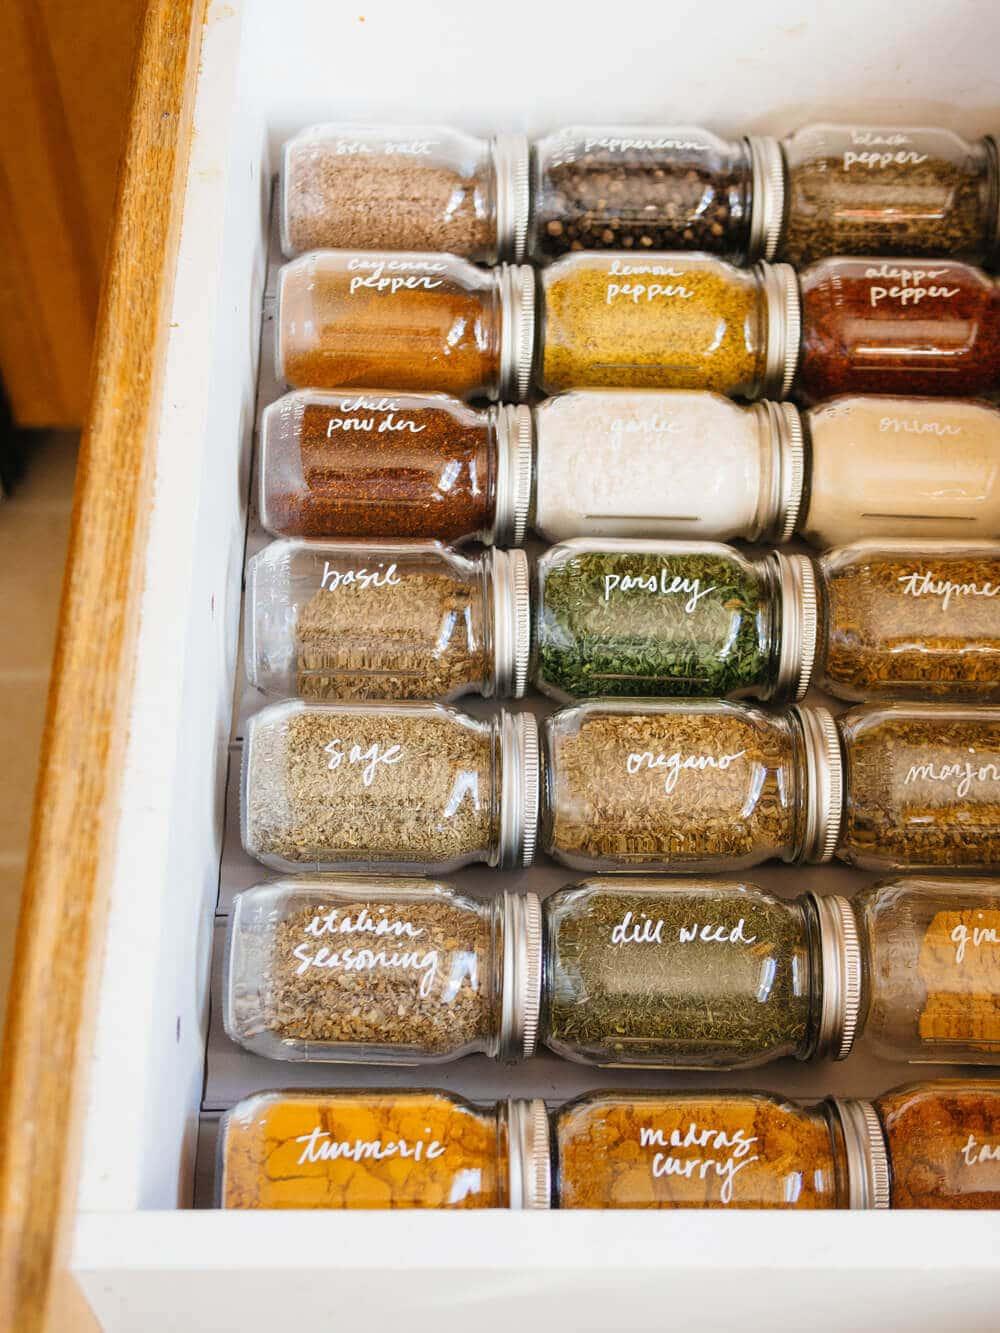 Simple spice drawer organization